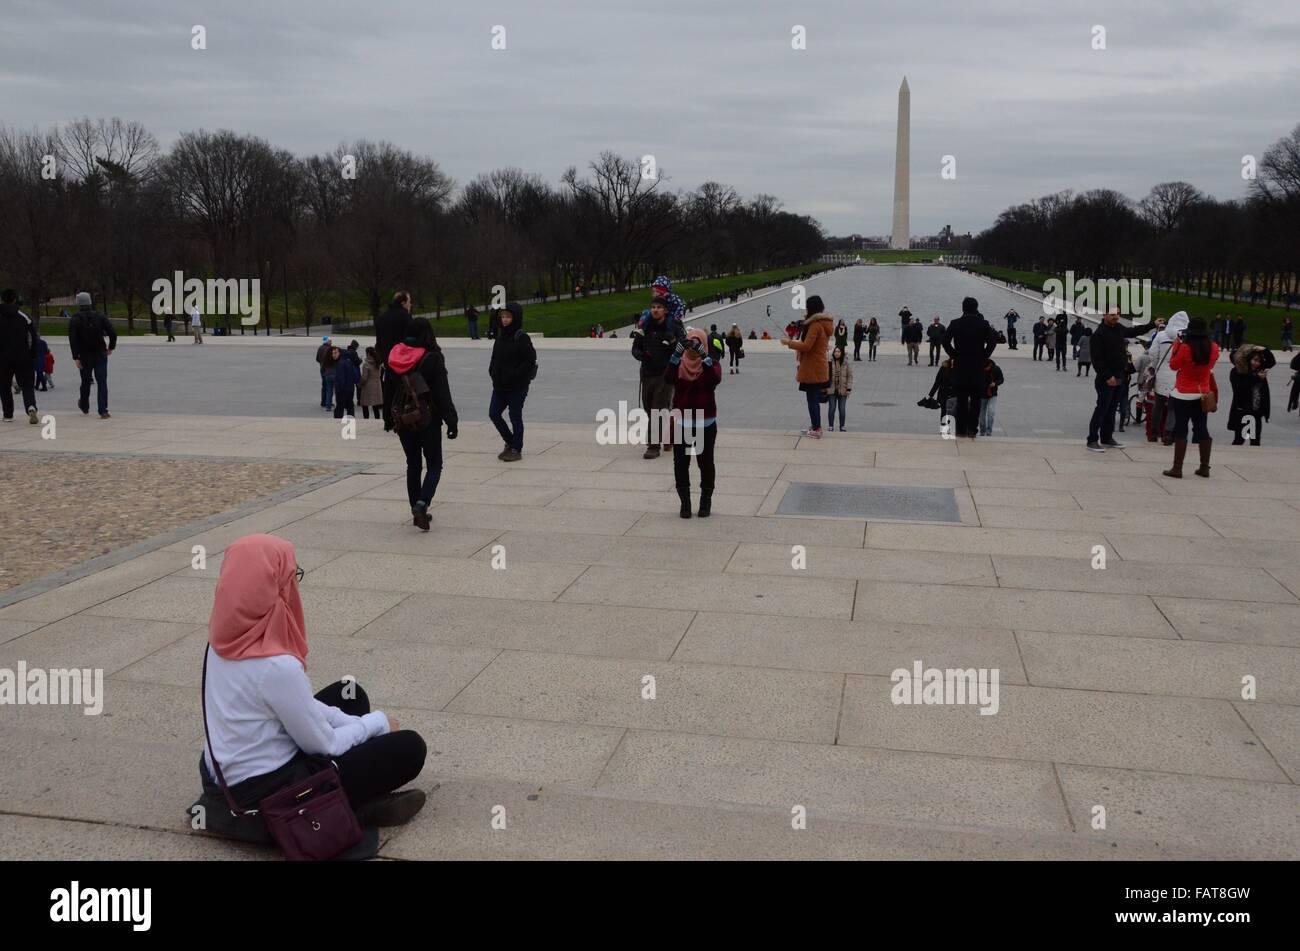 washington memorial reflecting pool - Stock Image